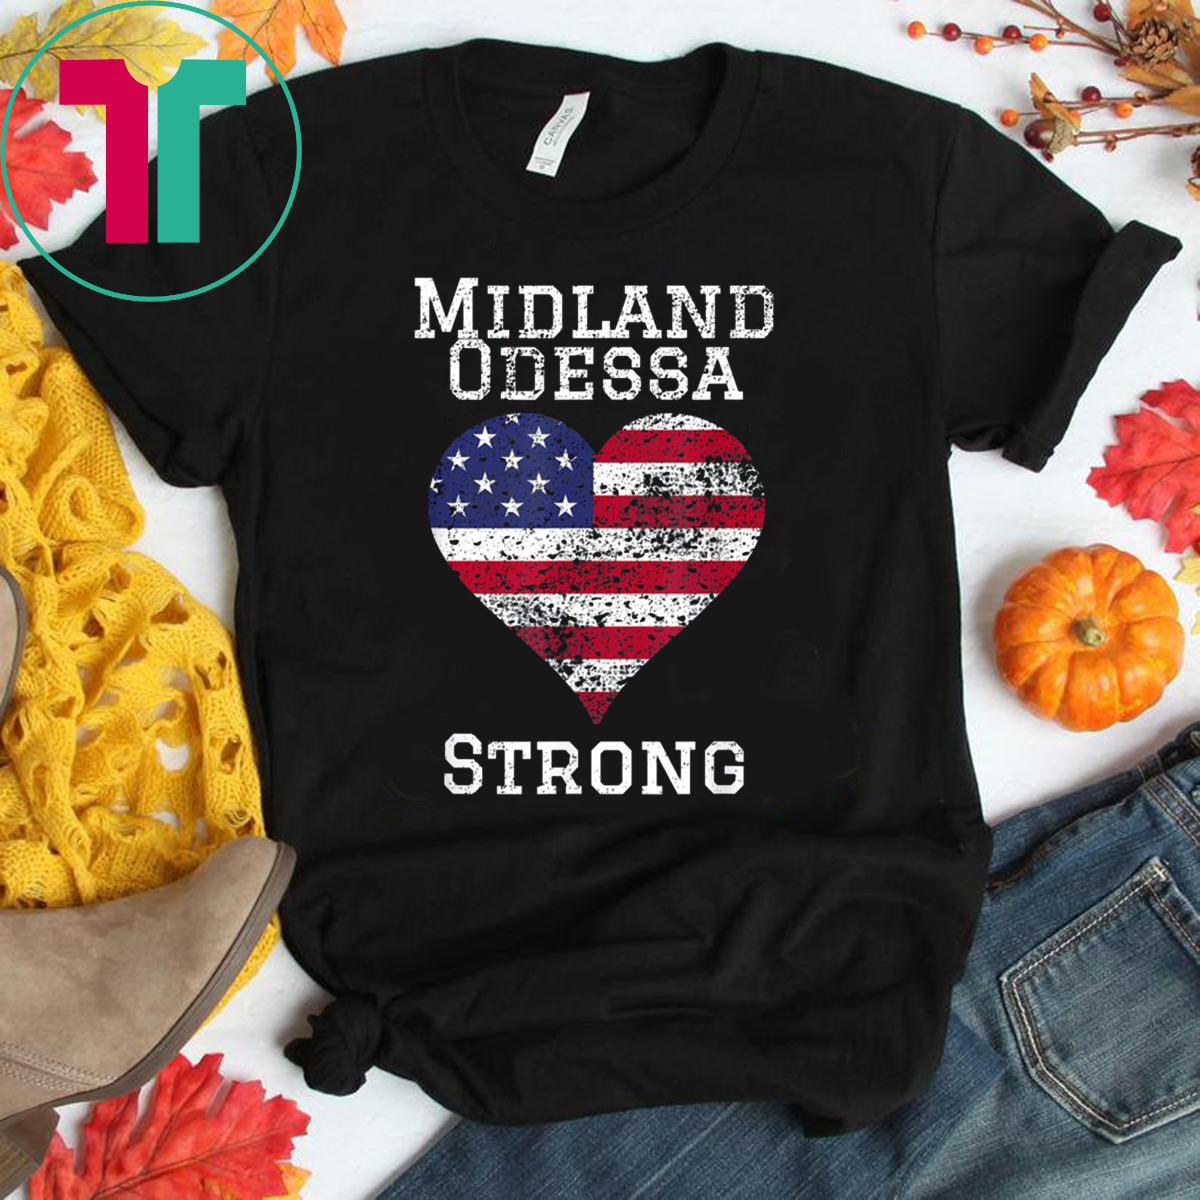 Midland Odessa Texas Strong T-Shirt